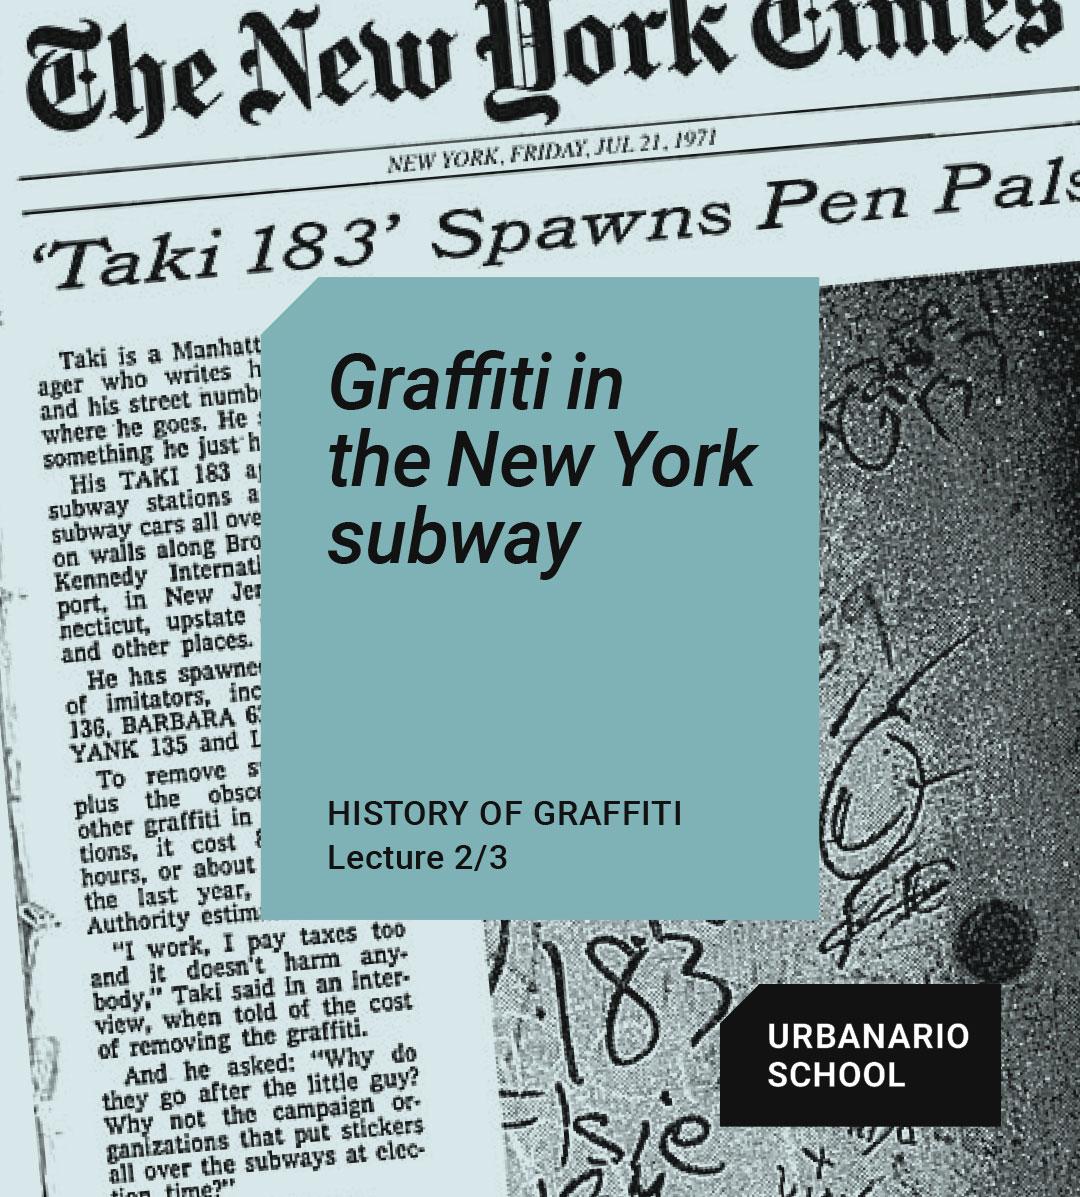 Graffiti in the New York subway - Urbanario School